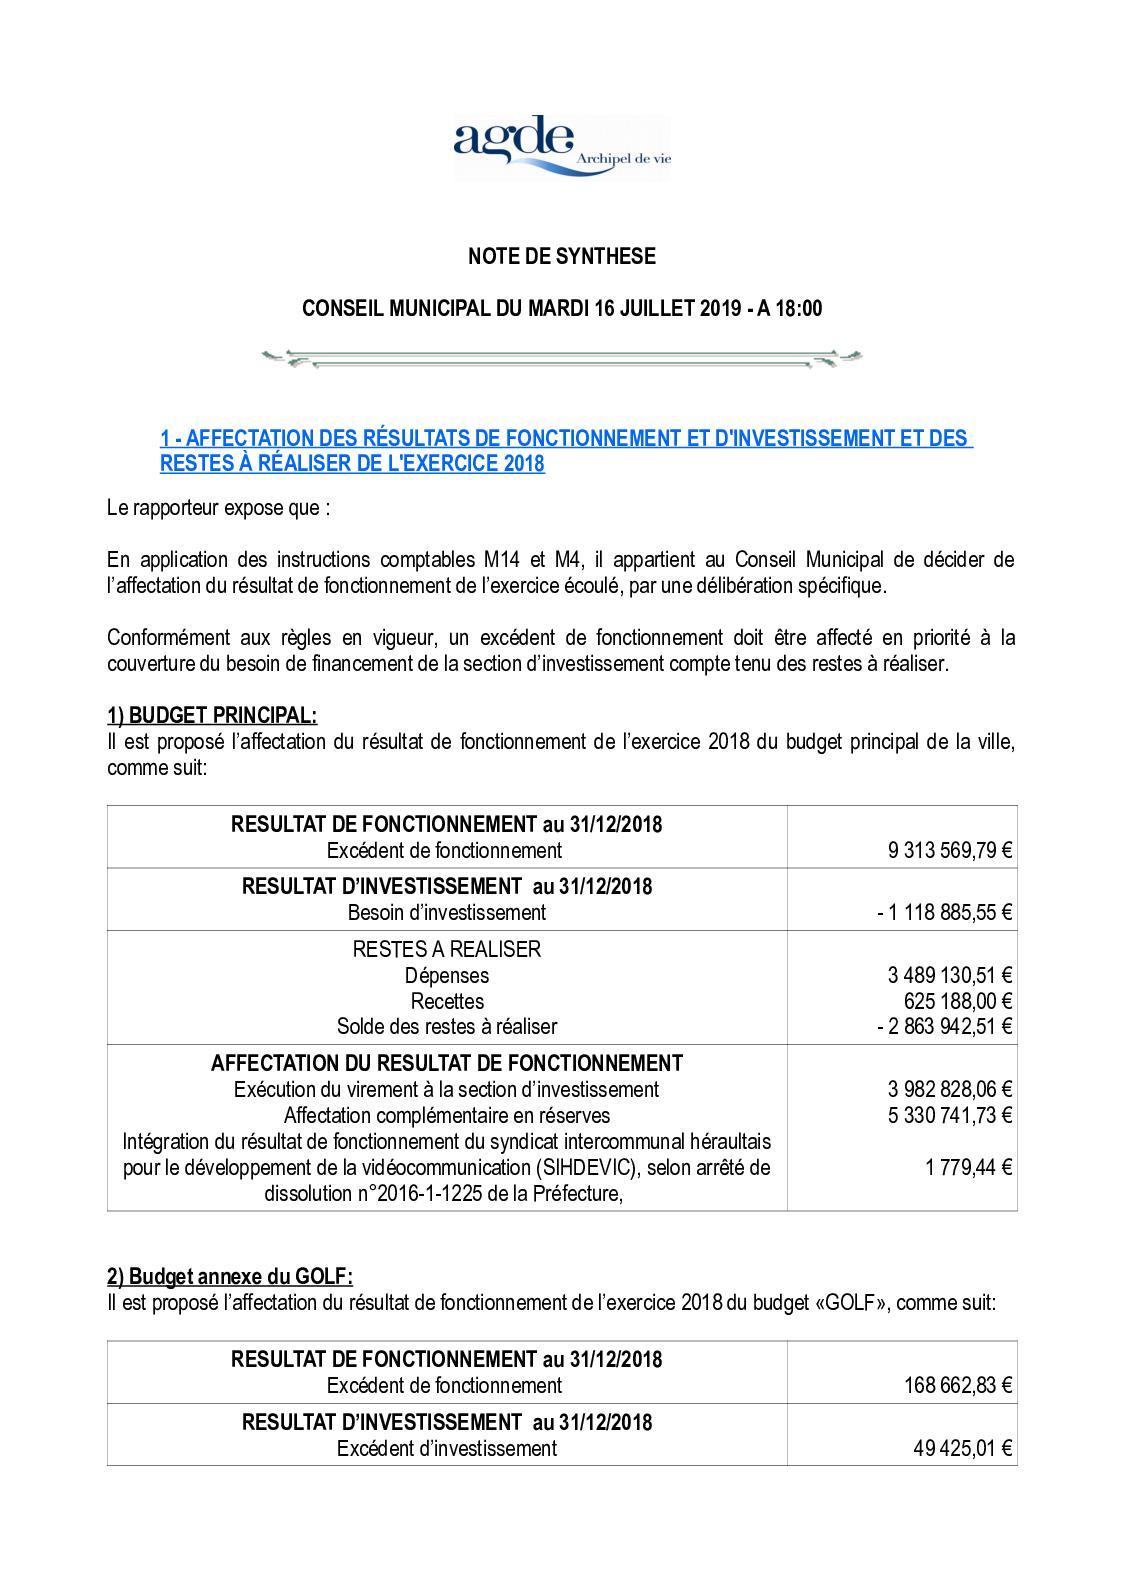 instruction comptable m14 2018